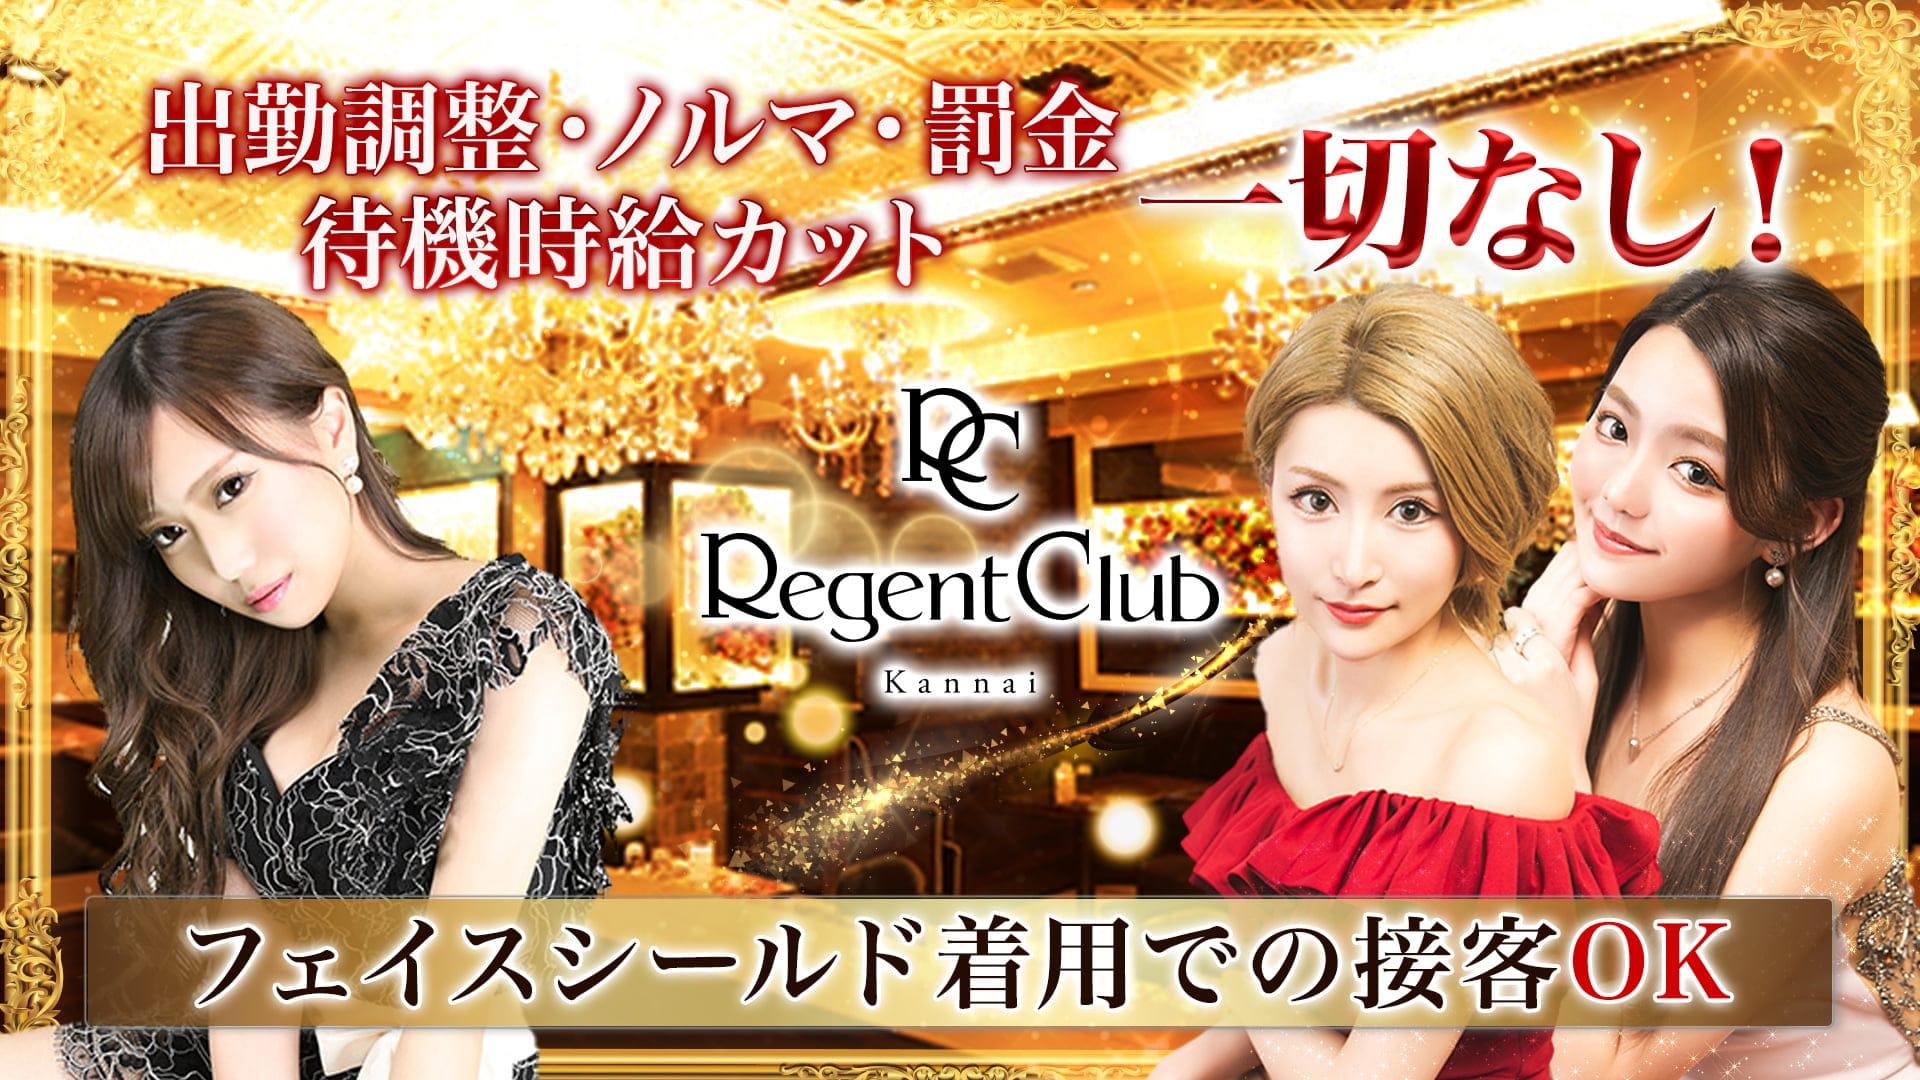 Regent Club Kannai~リージェントクラブ~【公式求人・体入情報】 関内キャバクラ TOP画像